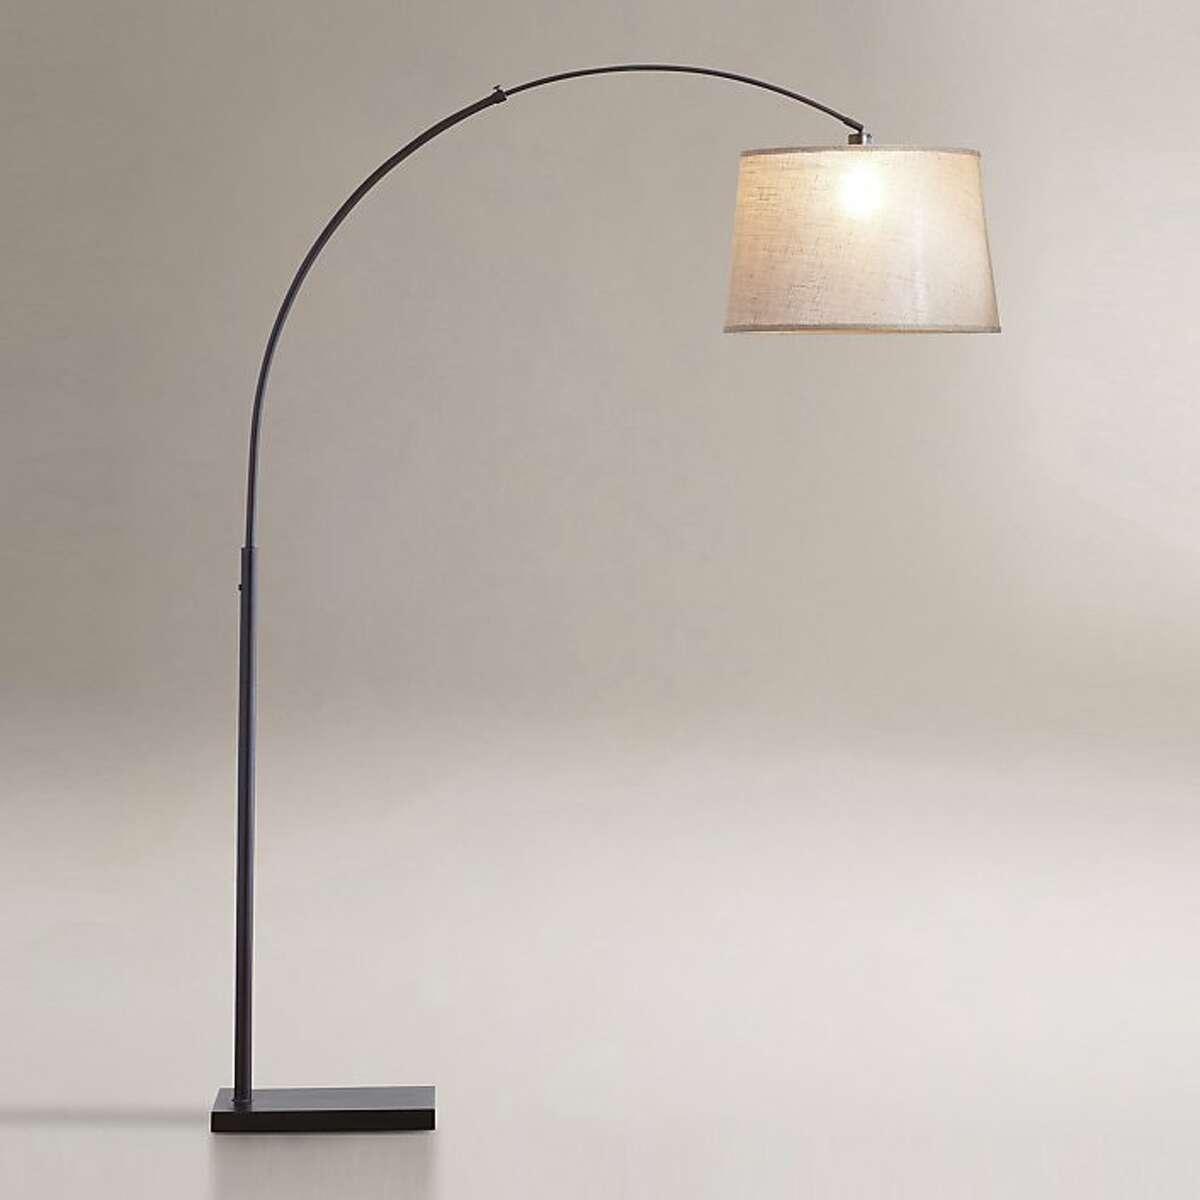 Less: $109.99 Loden Arc Floor Lamp Base www.worldmarket.com